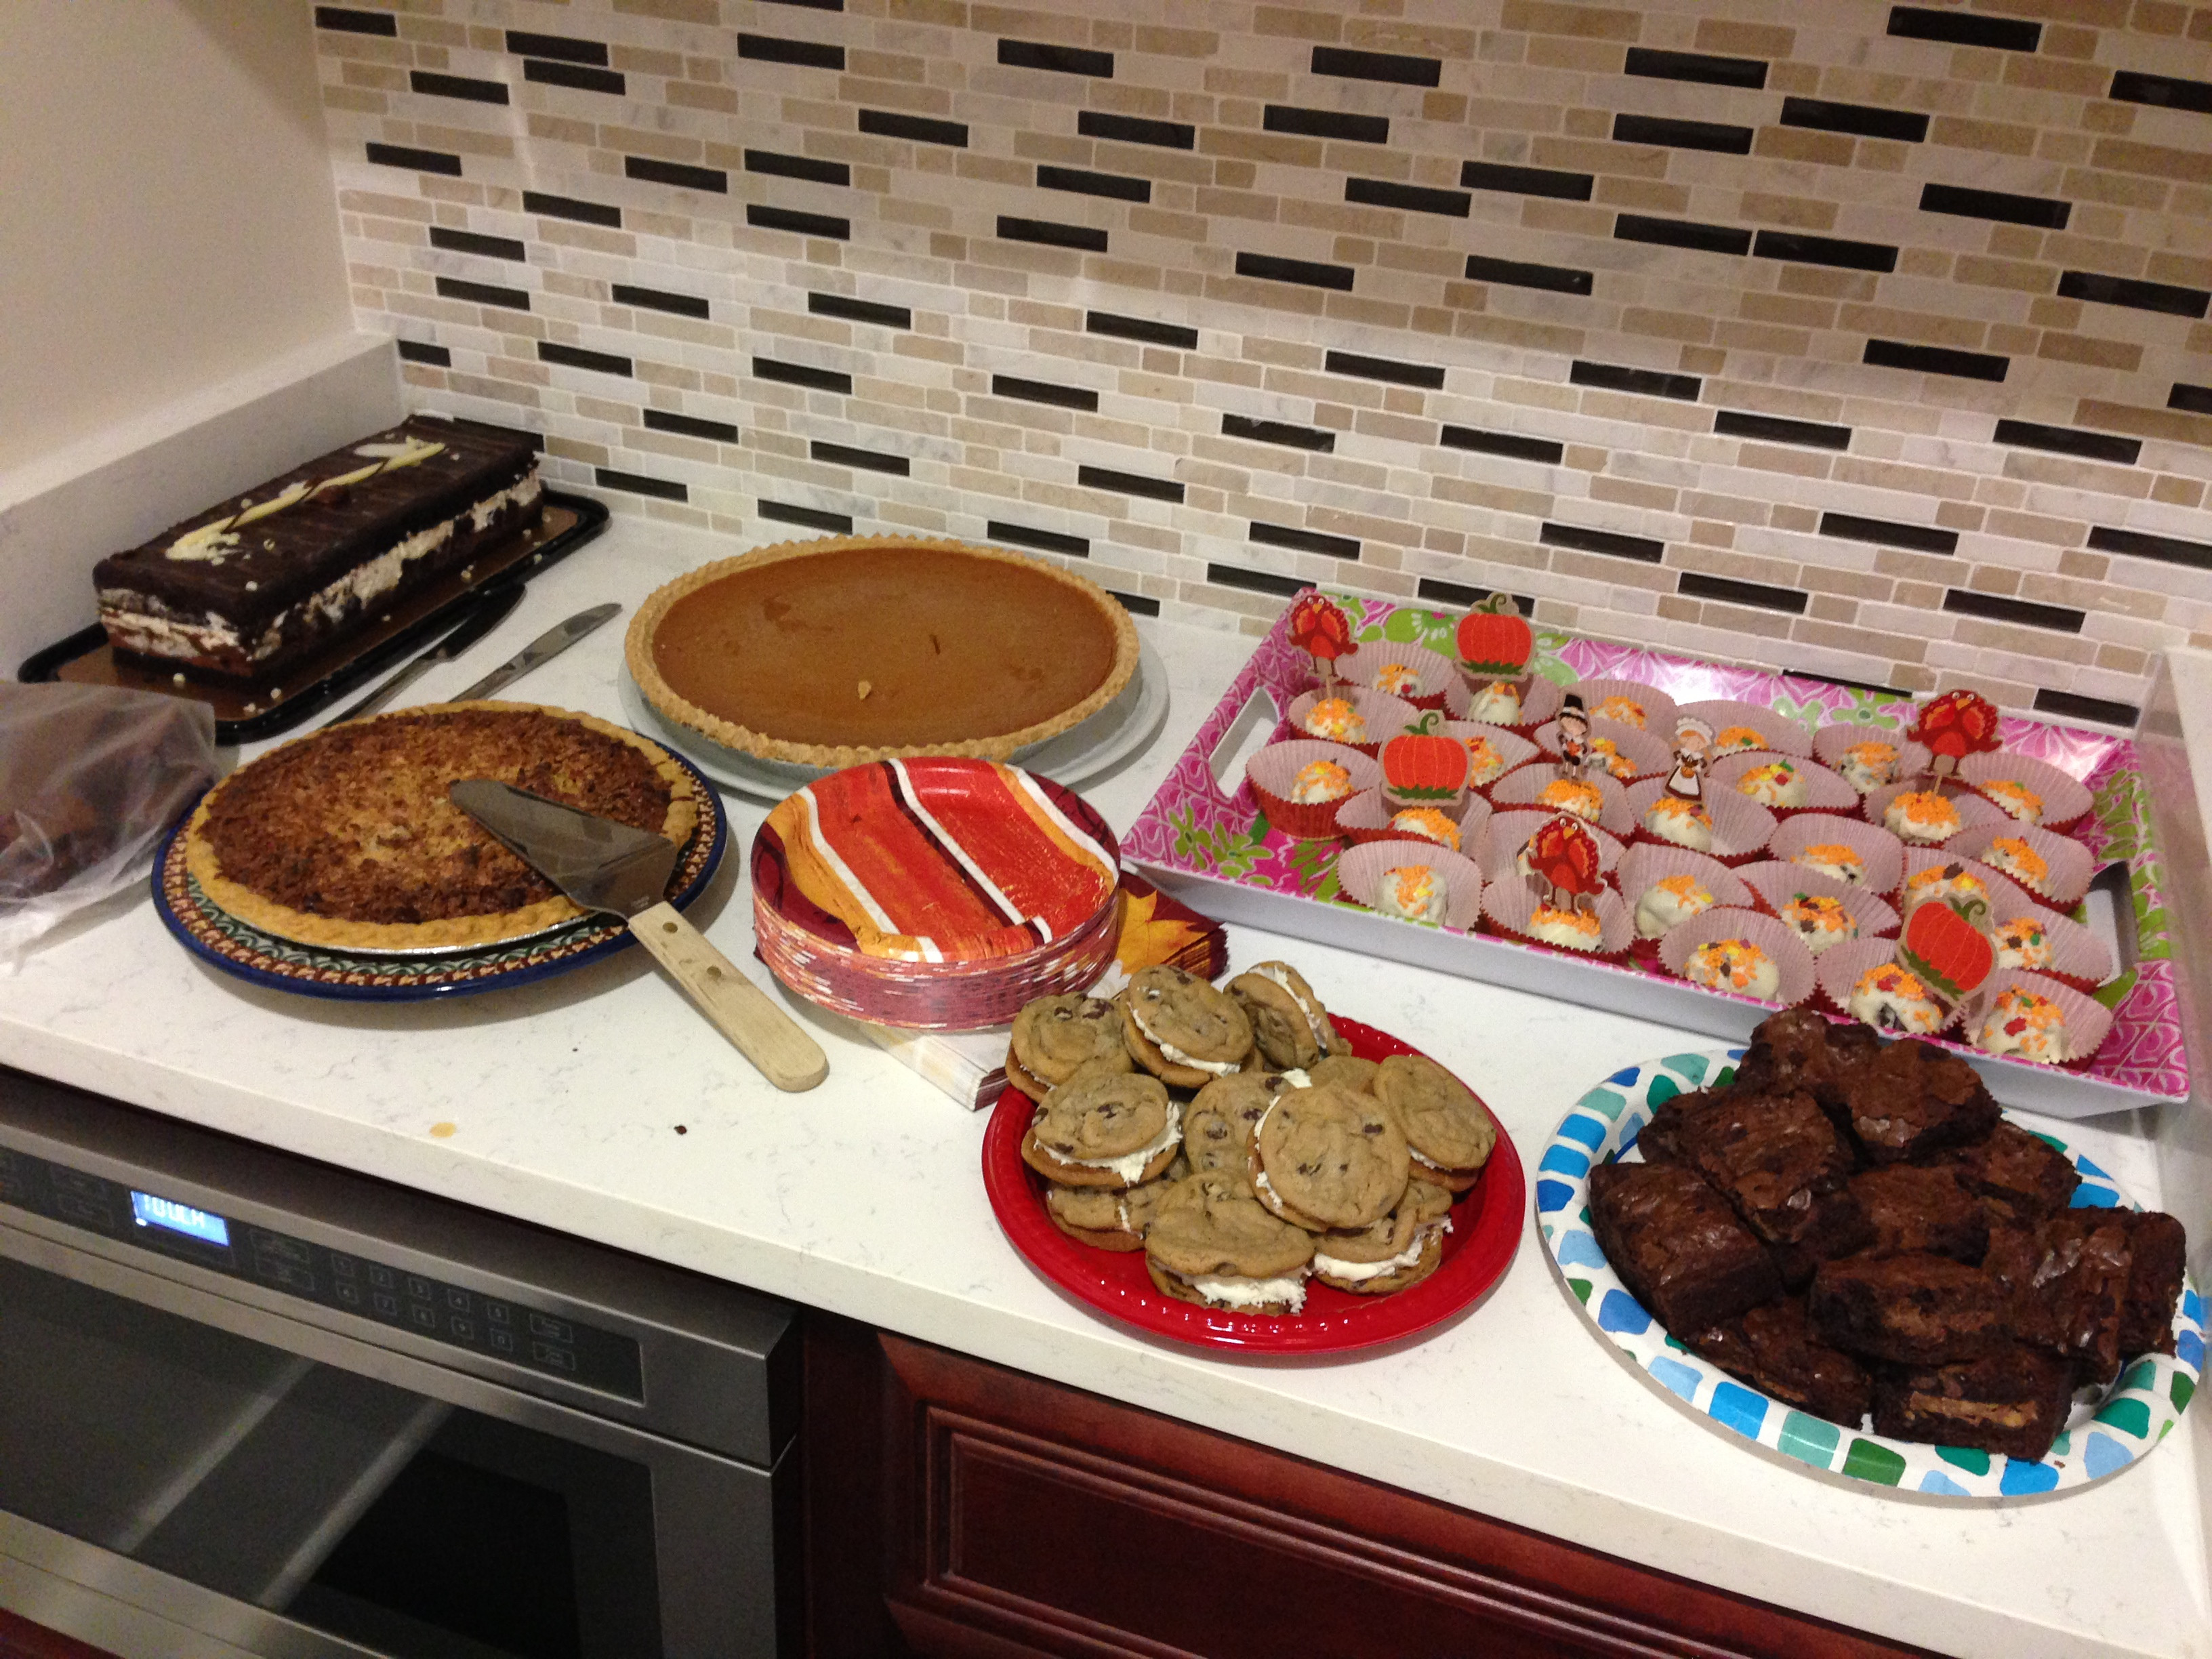 Pot Luck Desserts  Potluck Desserts Allister North Hills